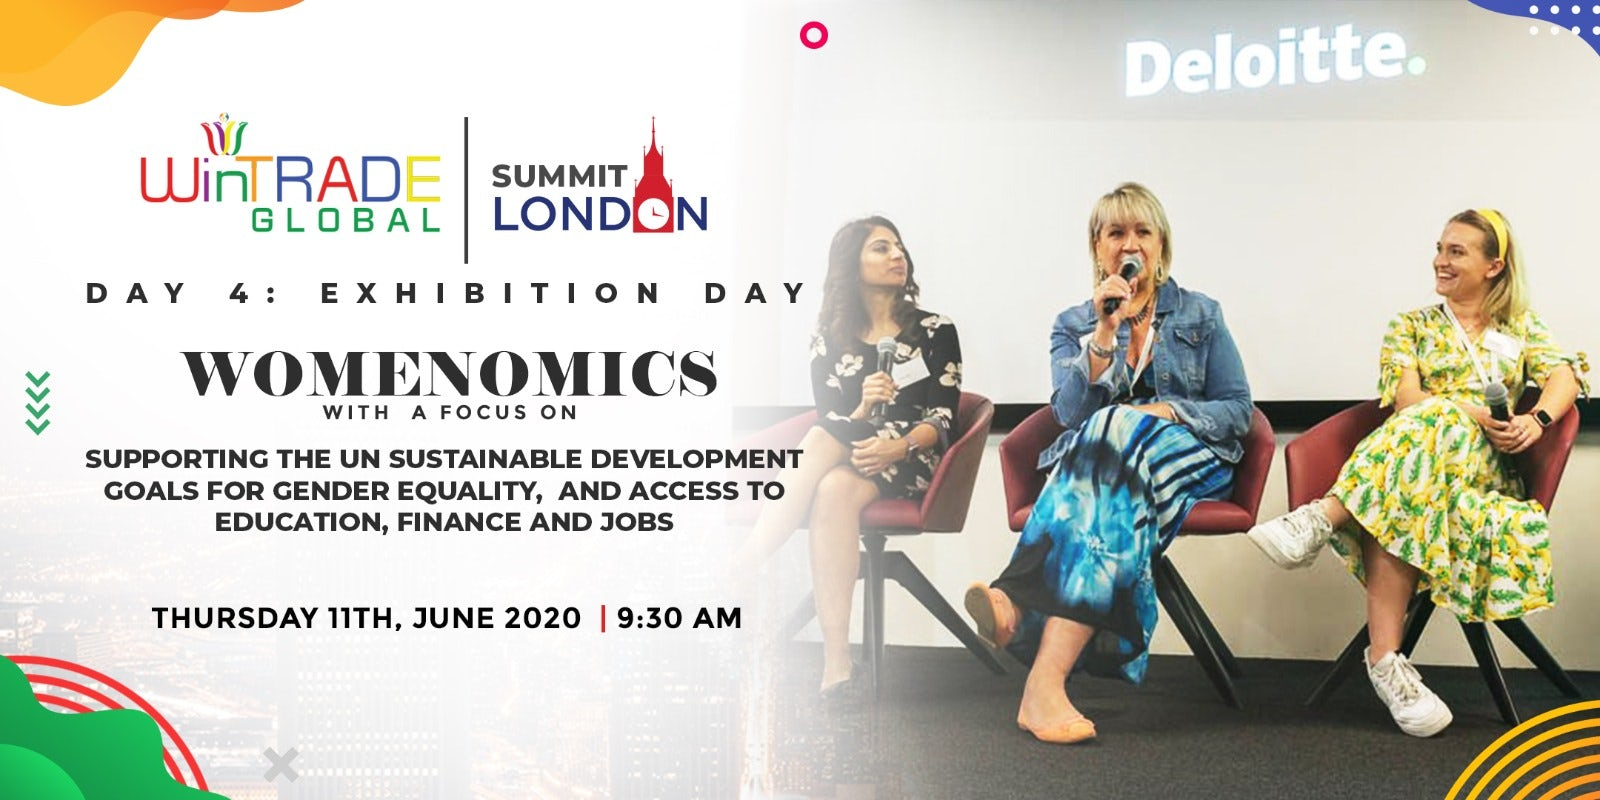 Wintrade Global 11th June 2020